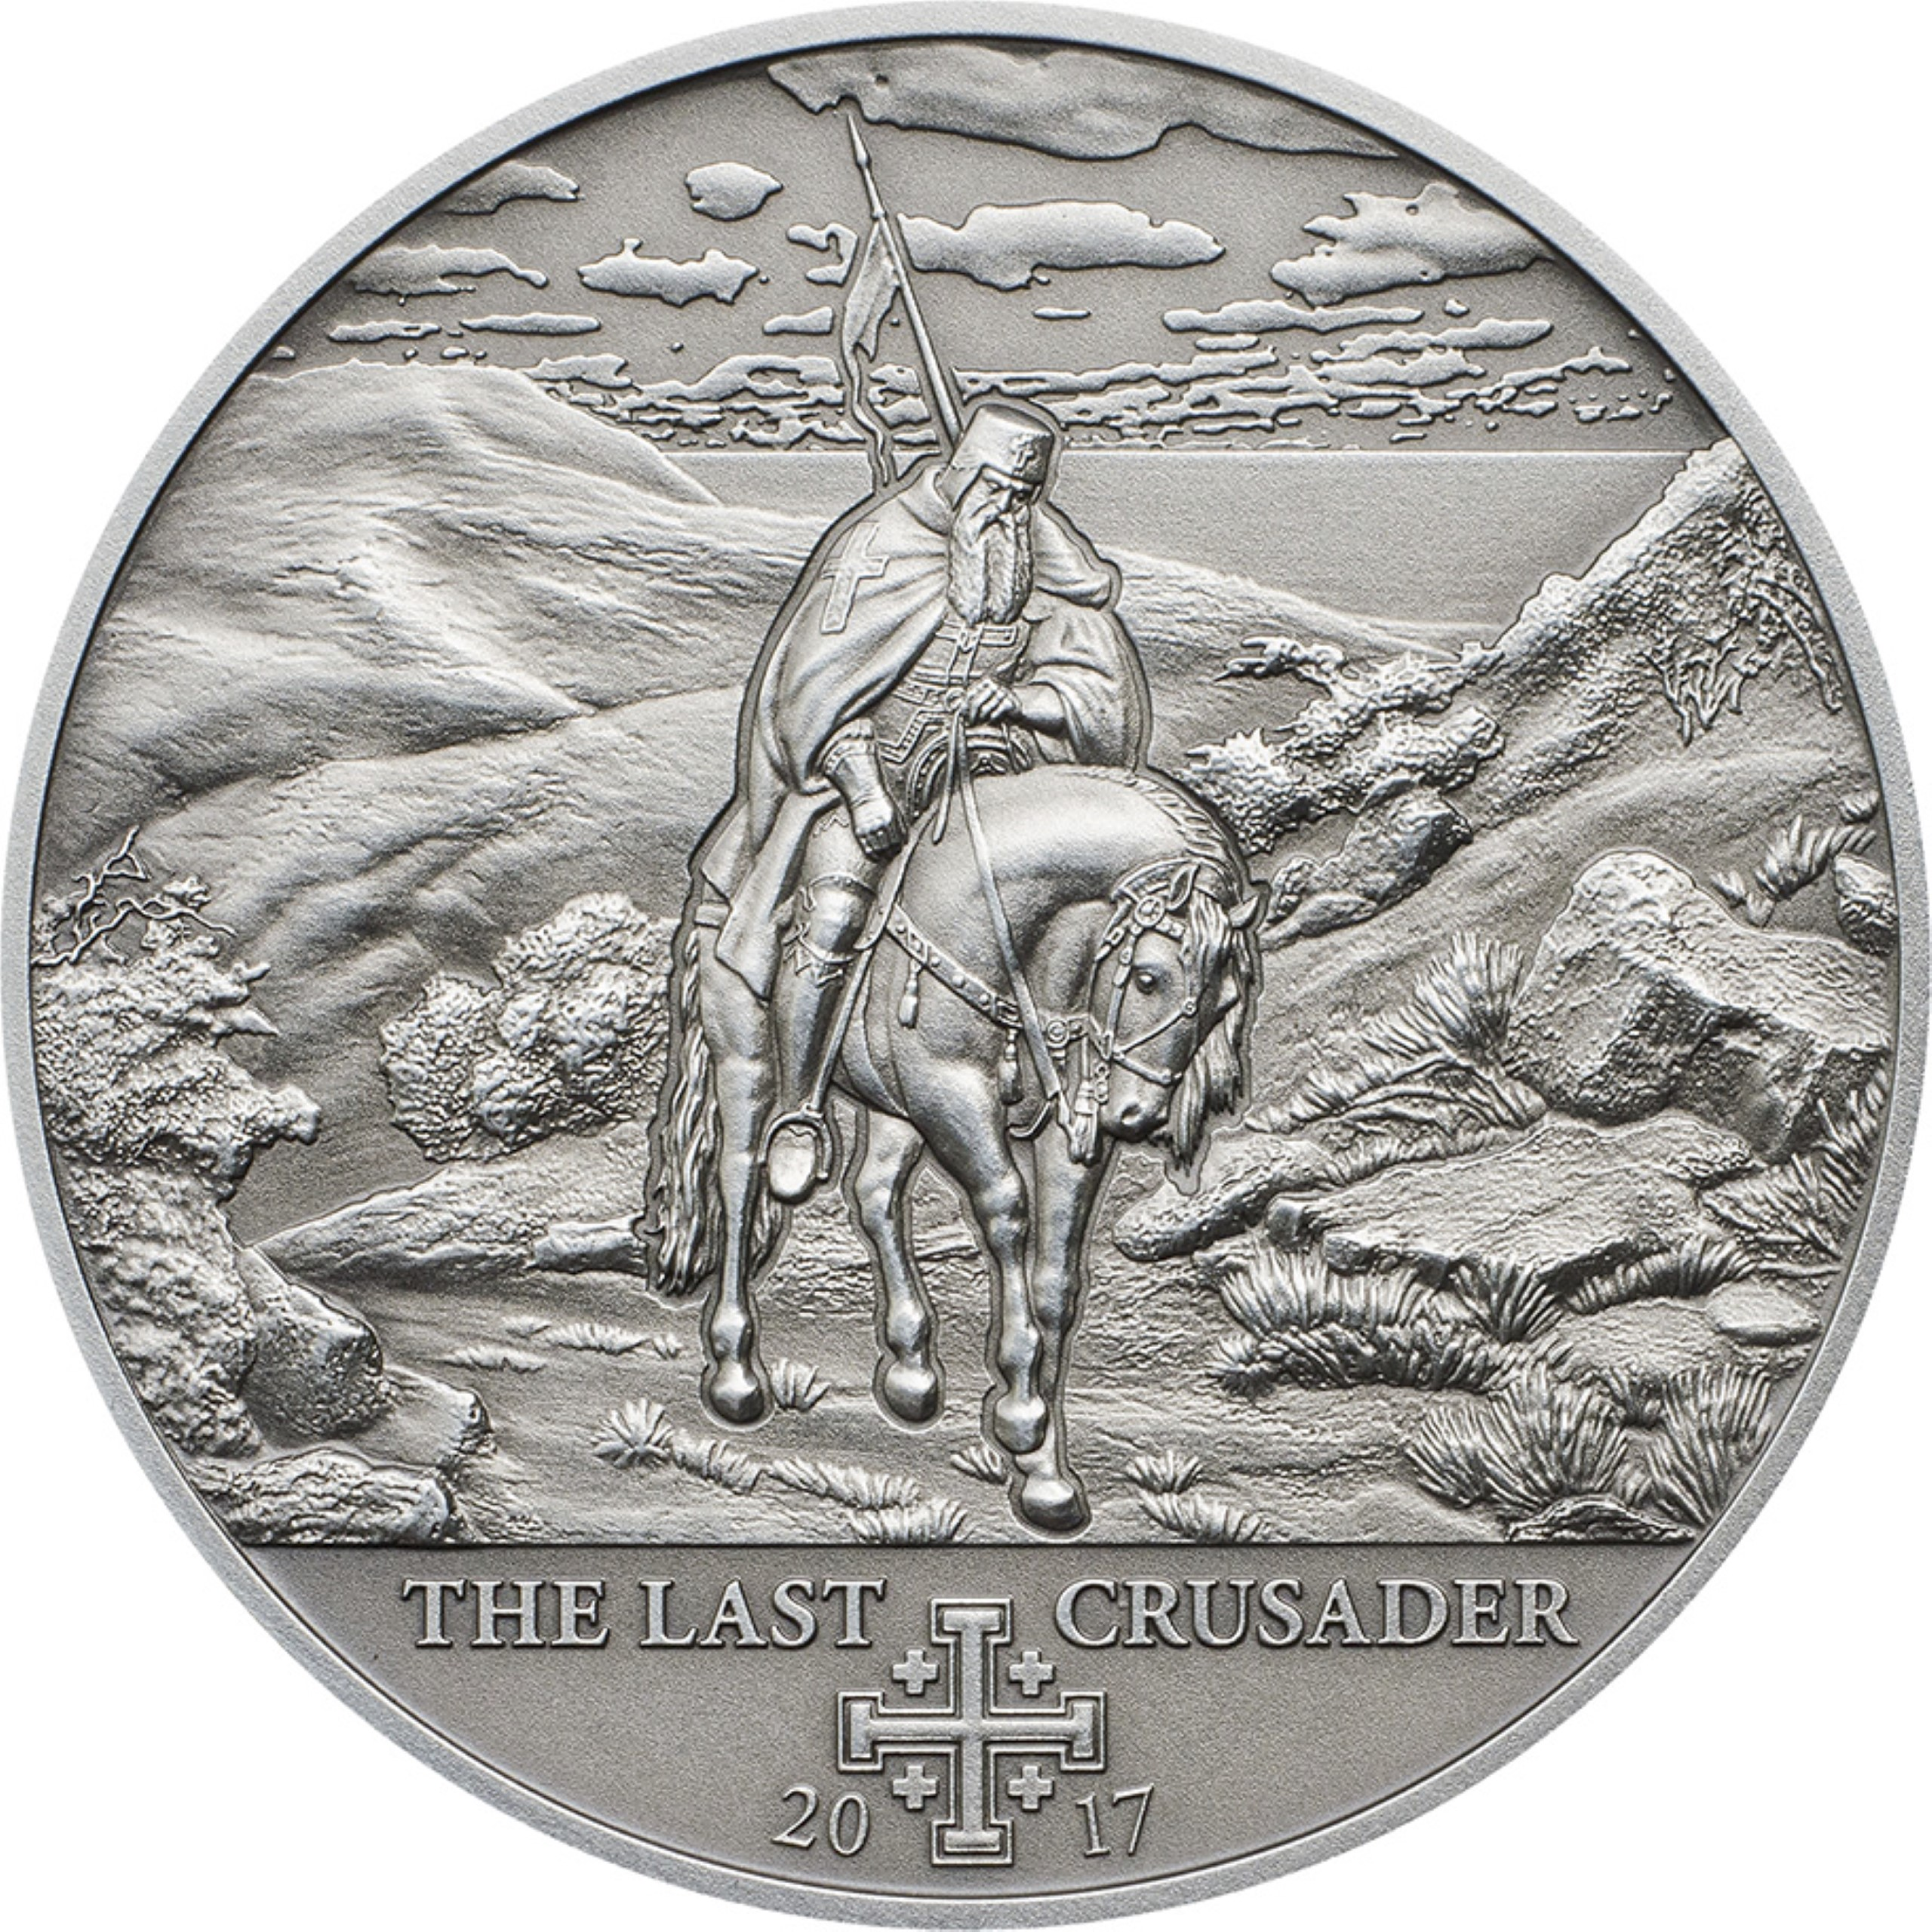 Cook Islands - 2017 - 5 Dollars - History of the Crusades THE LAST CRUSADER (10th Crusade)